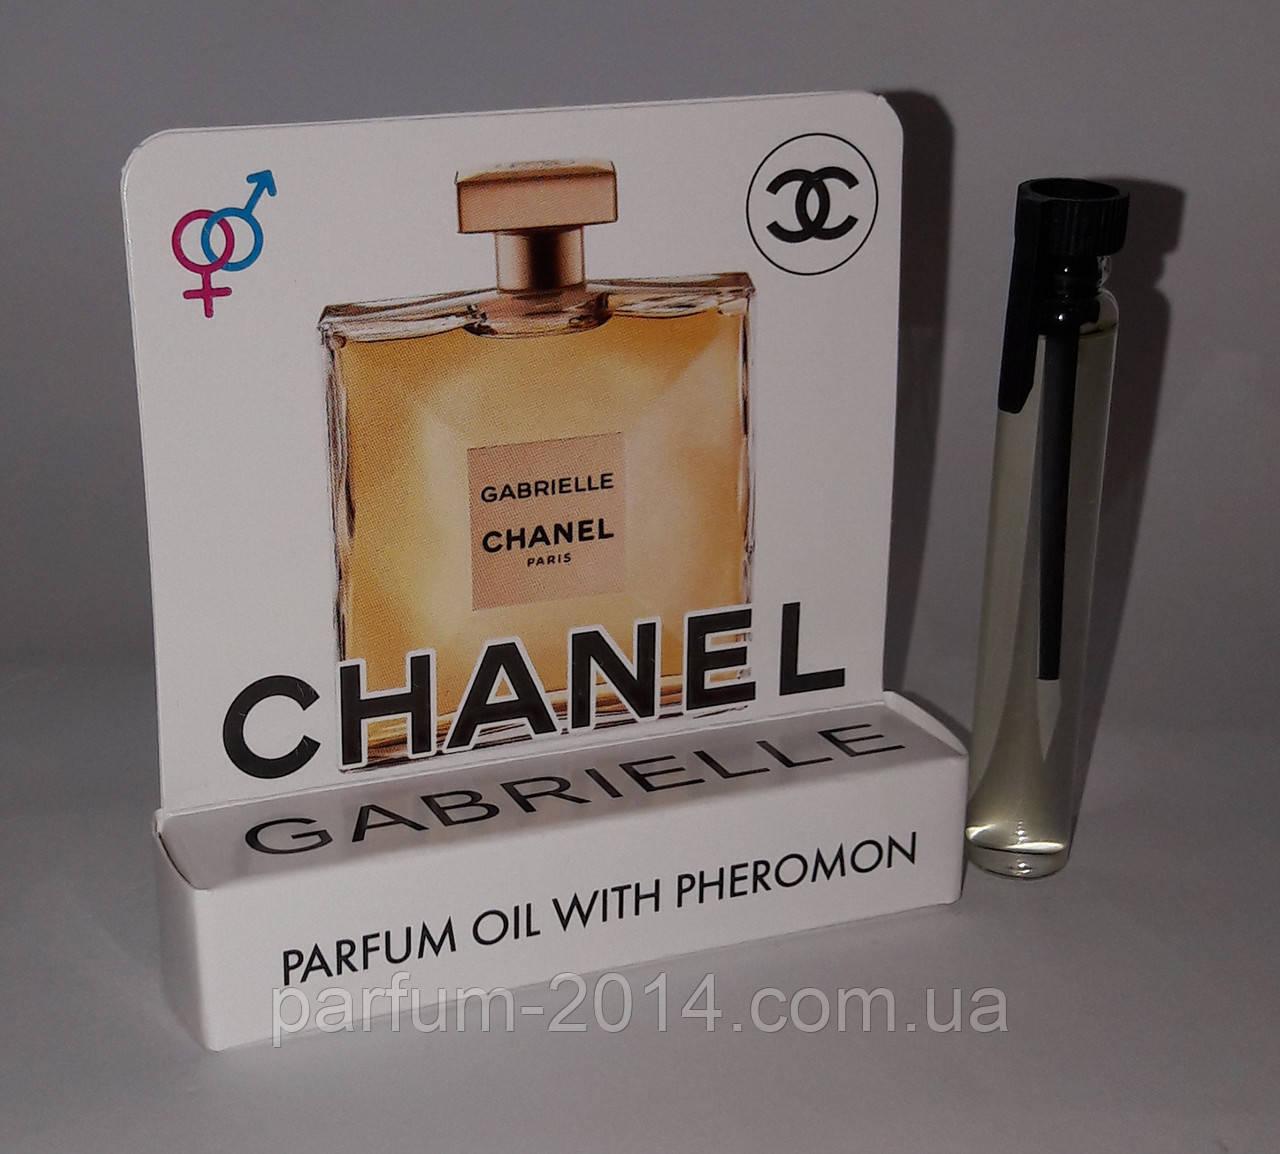 Масляные духи с феромонами Chanel Gabrielle 5 ml (реплика)